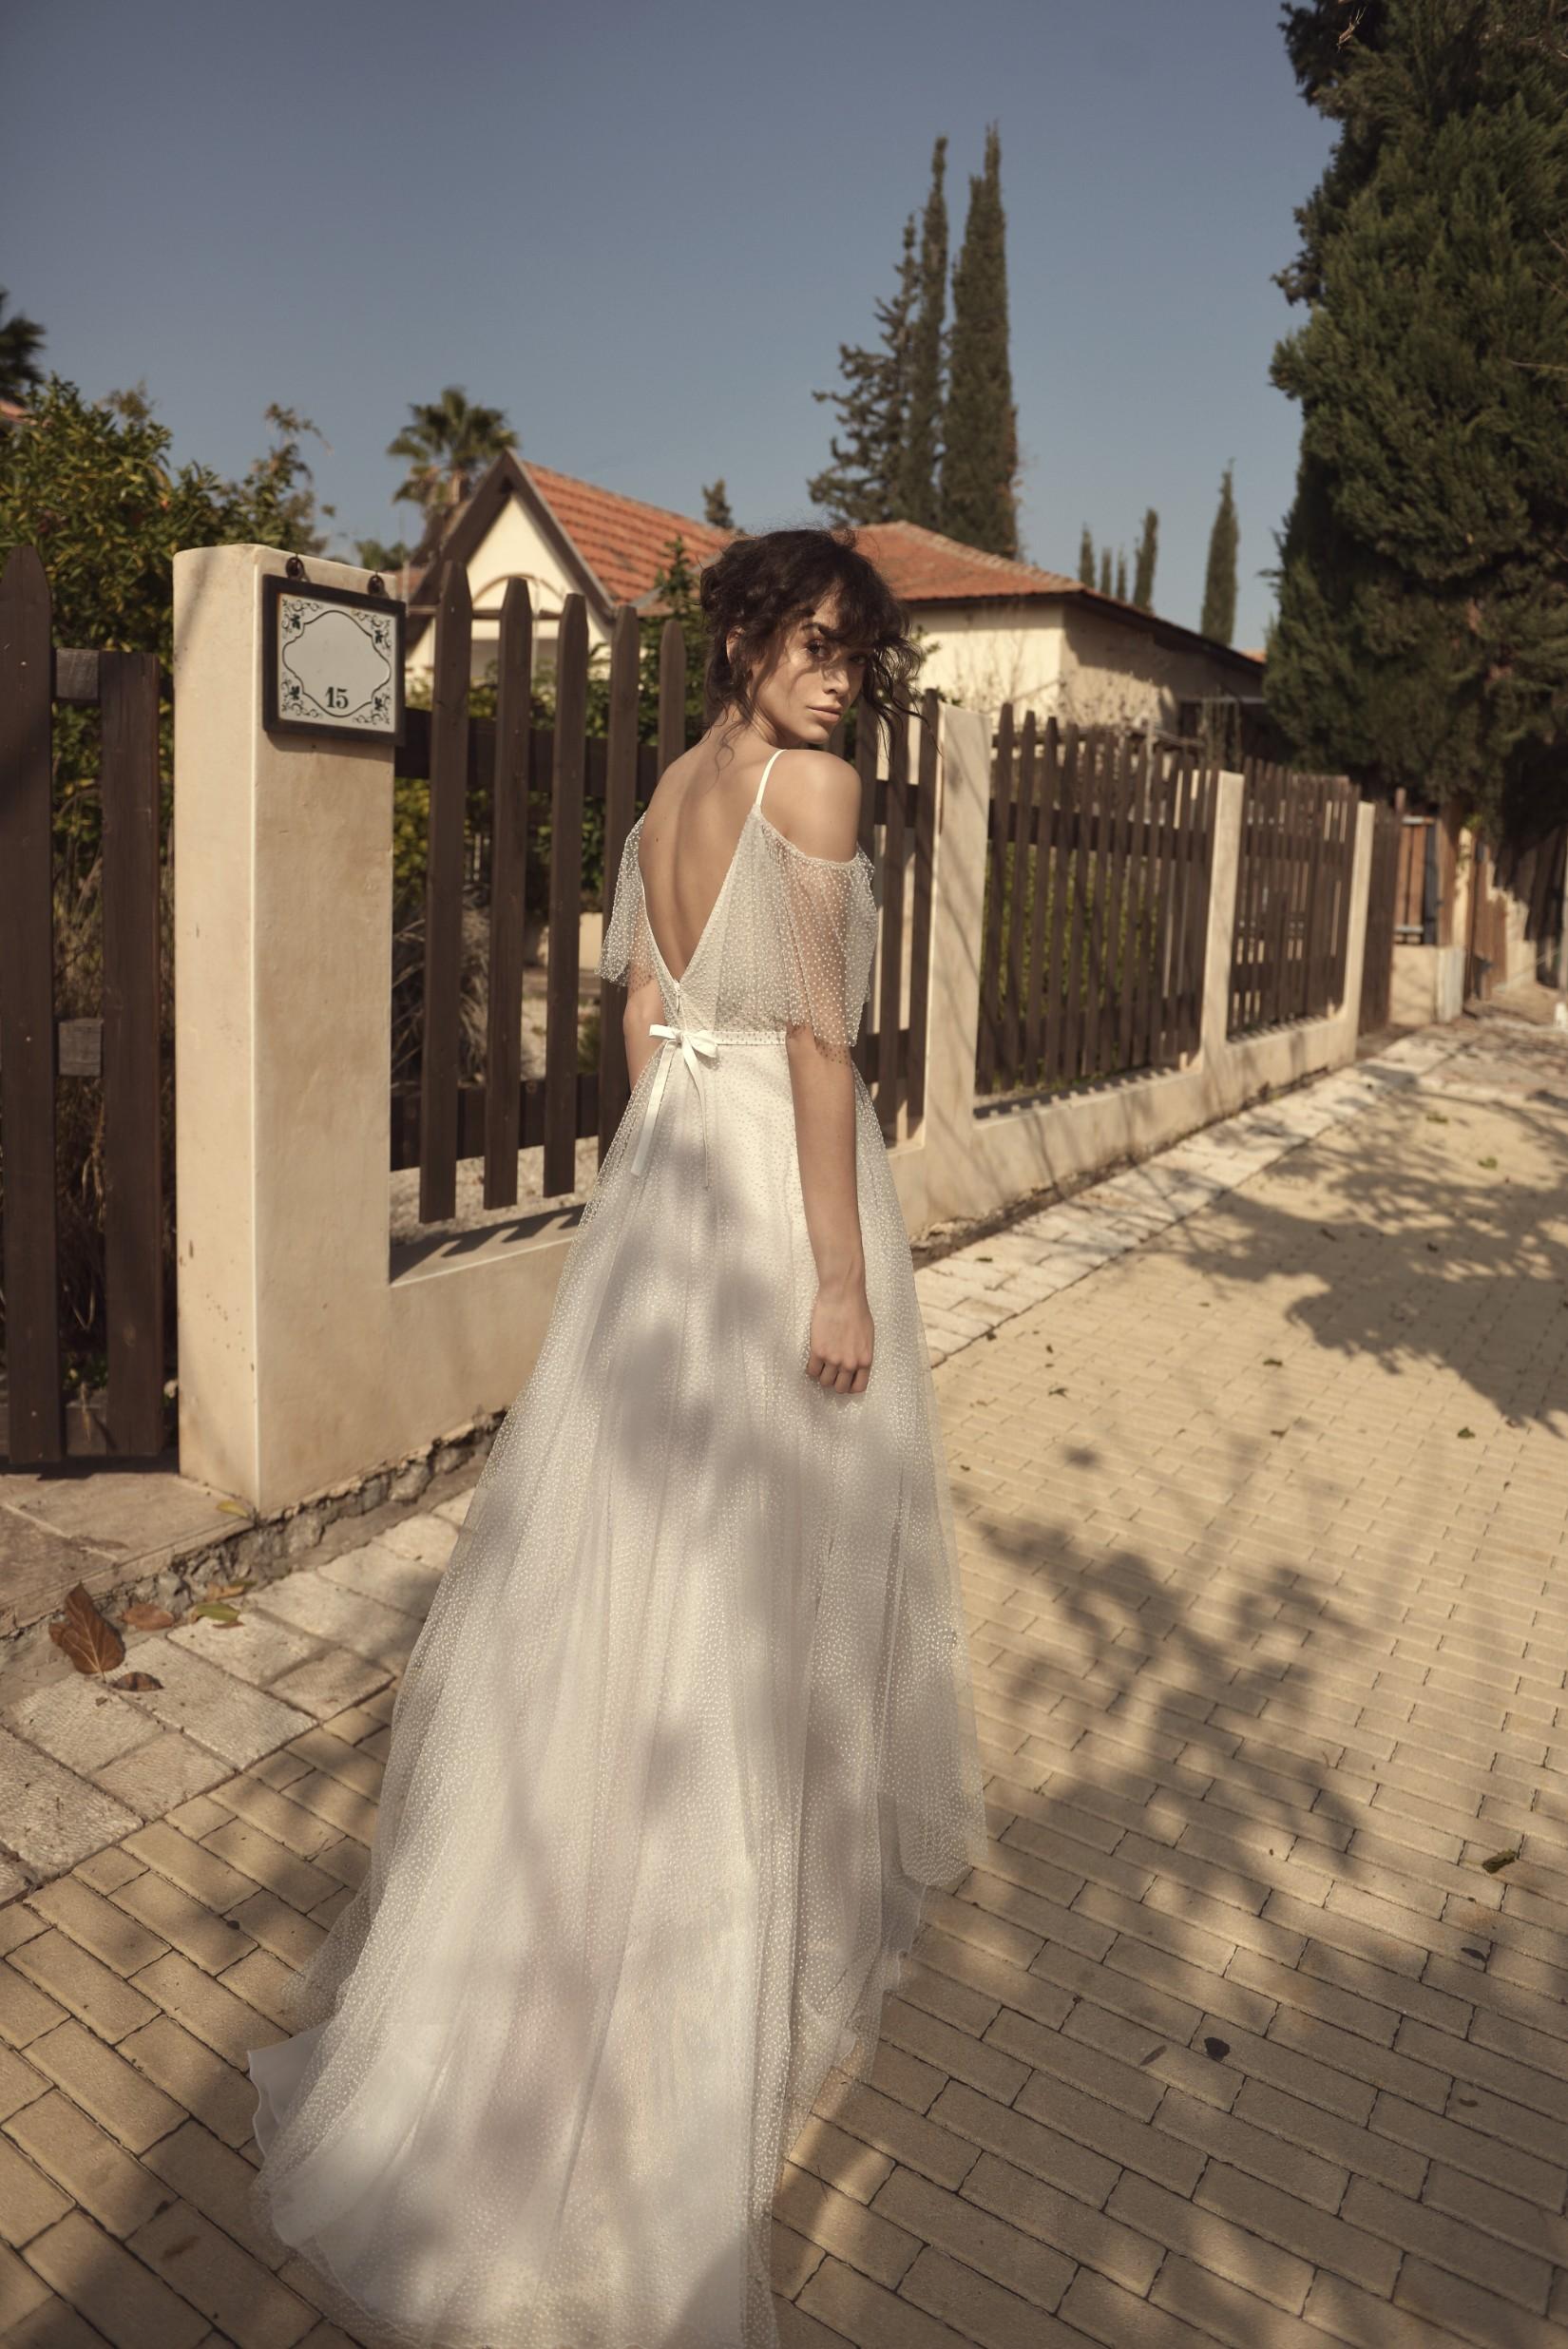 Italian Romance: קולקציית 2018 של עדי גרומן